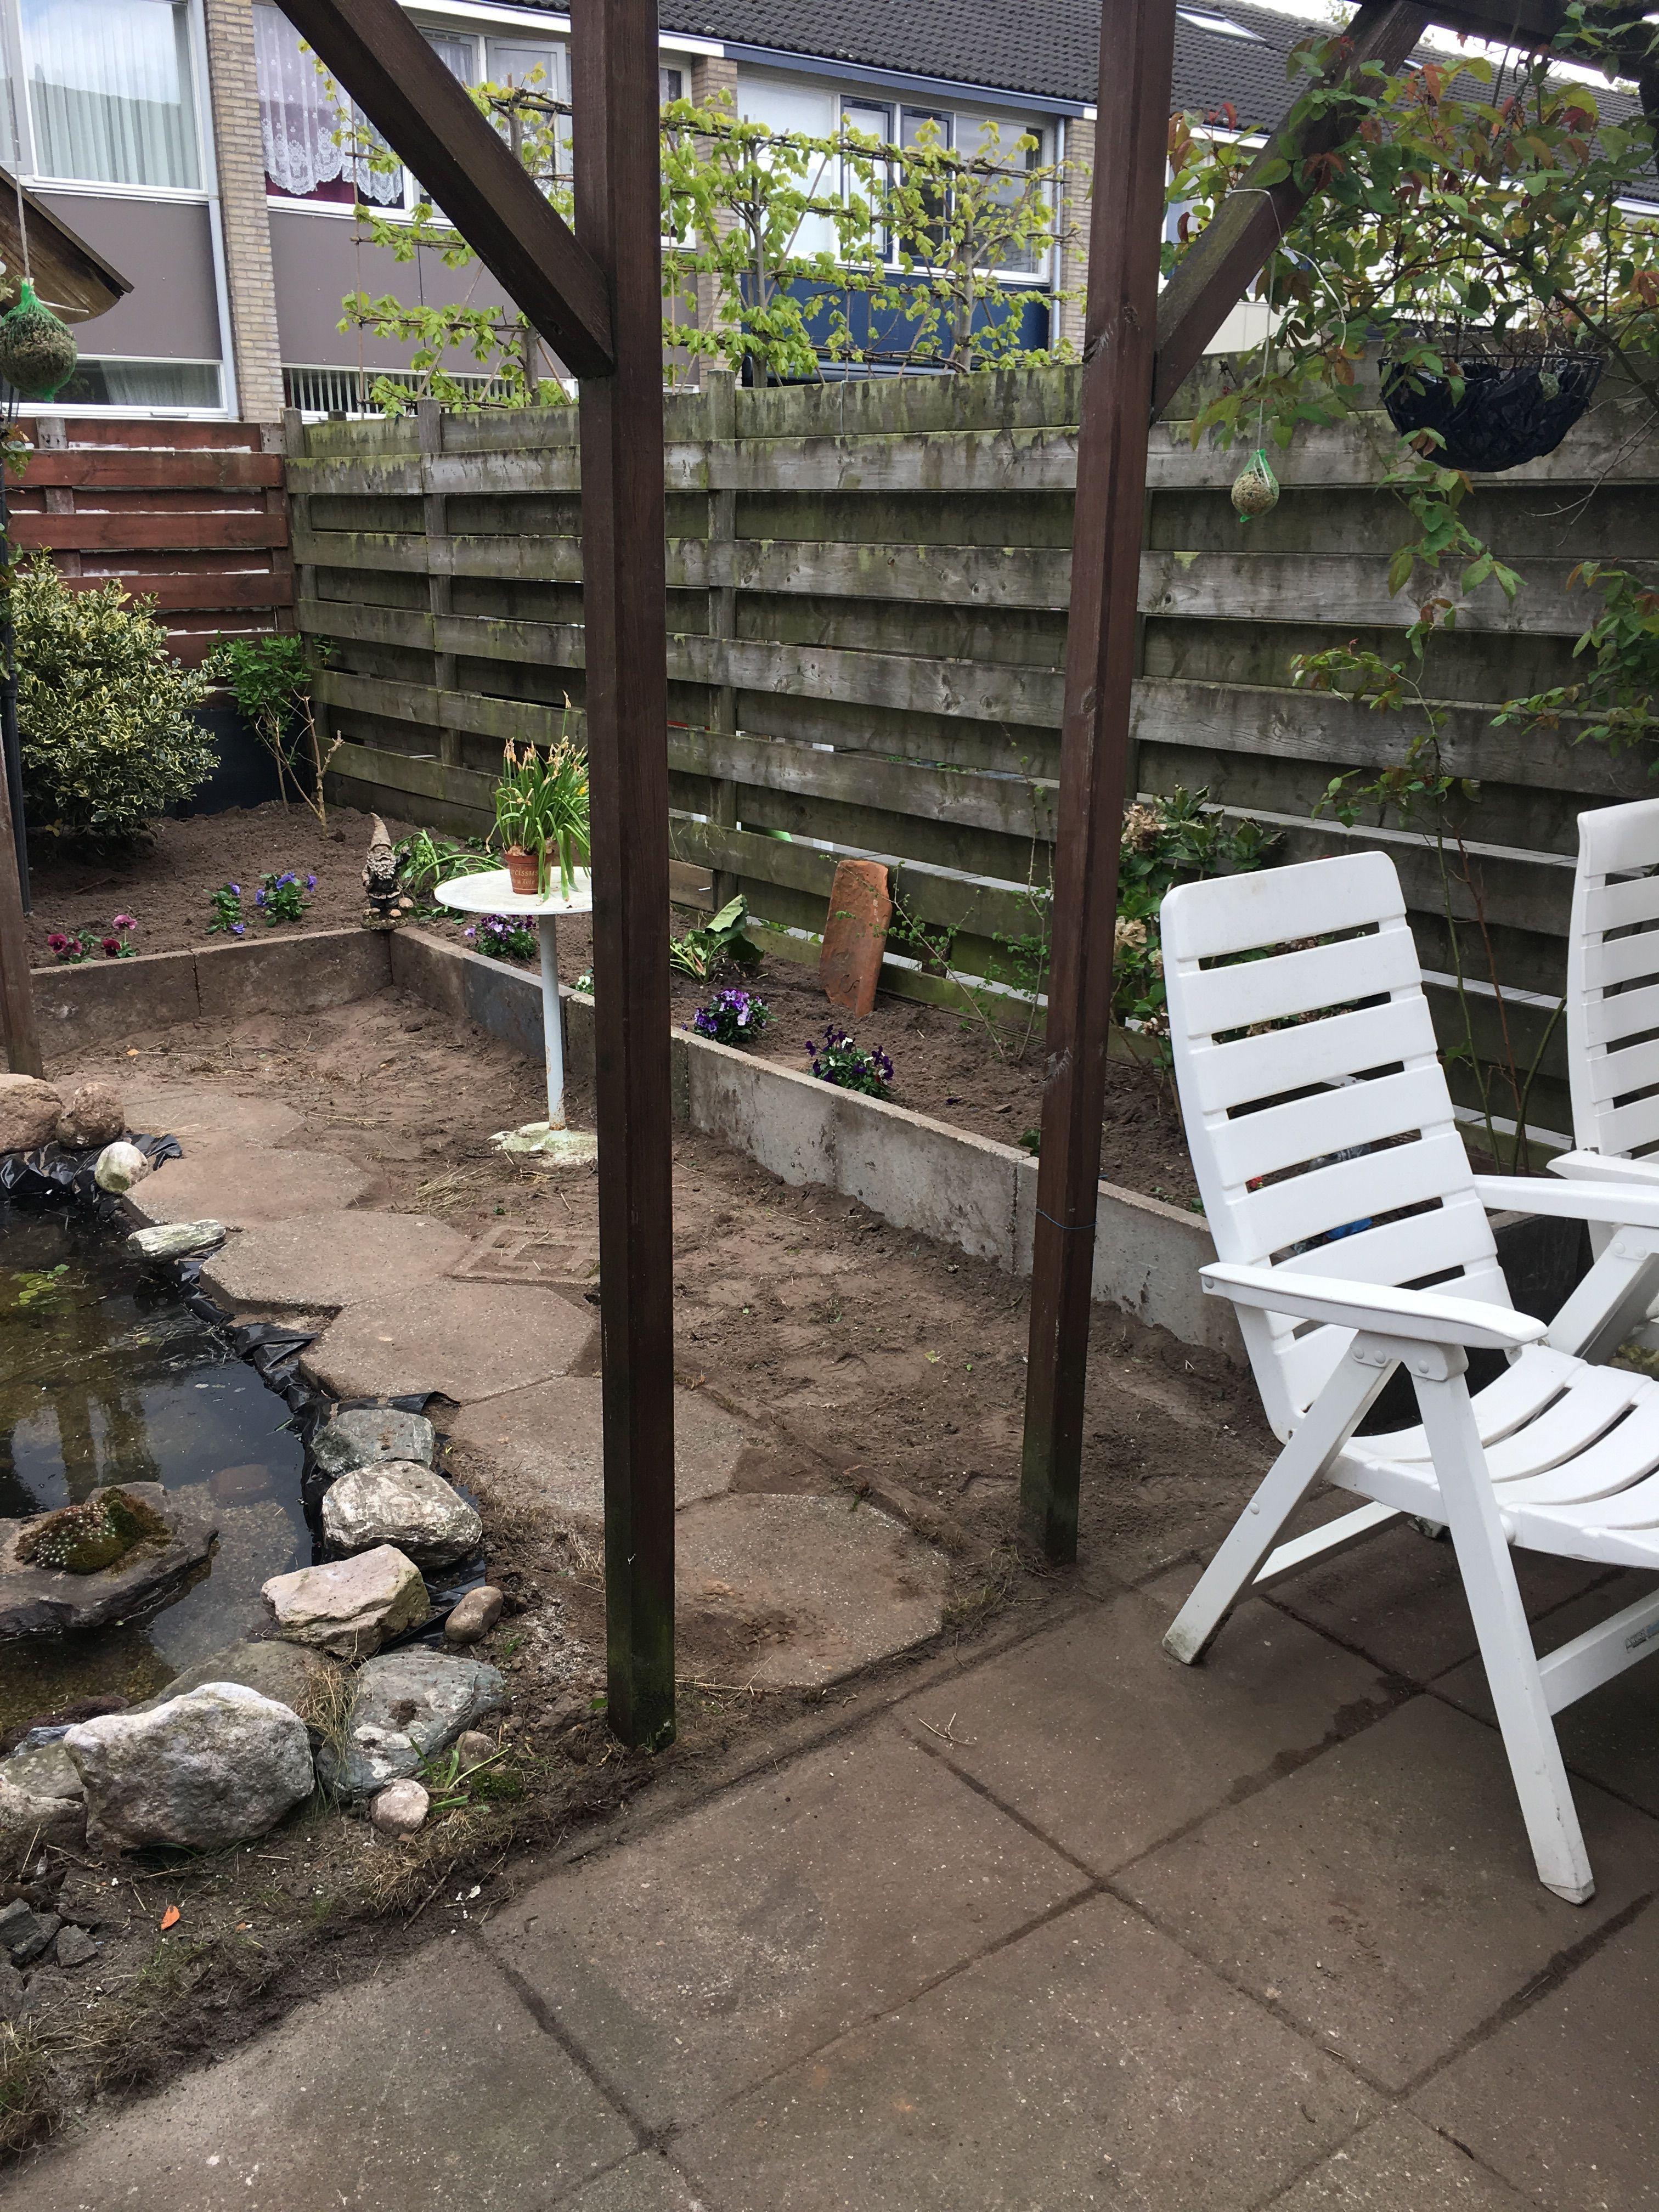 #project #tuin #klaar @aquamomentnetherlands